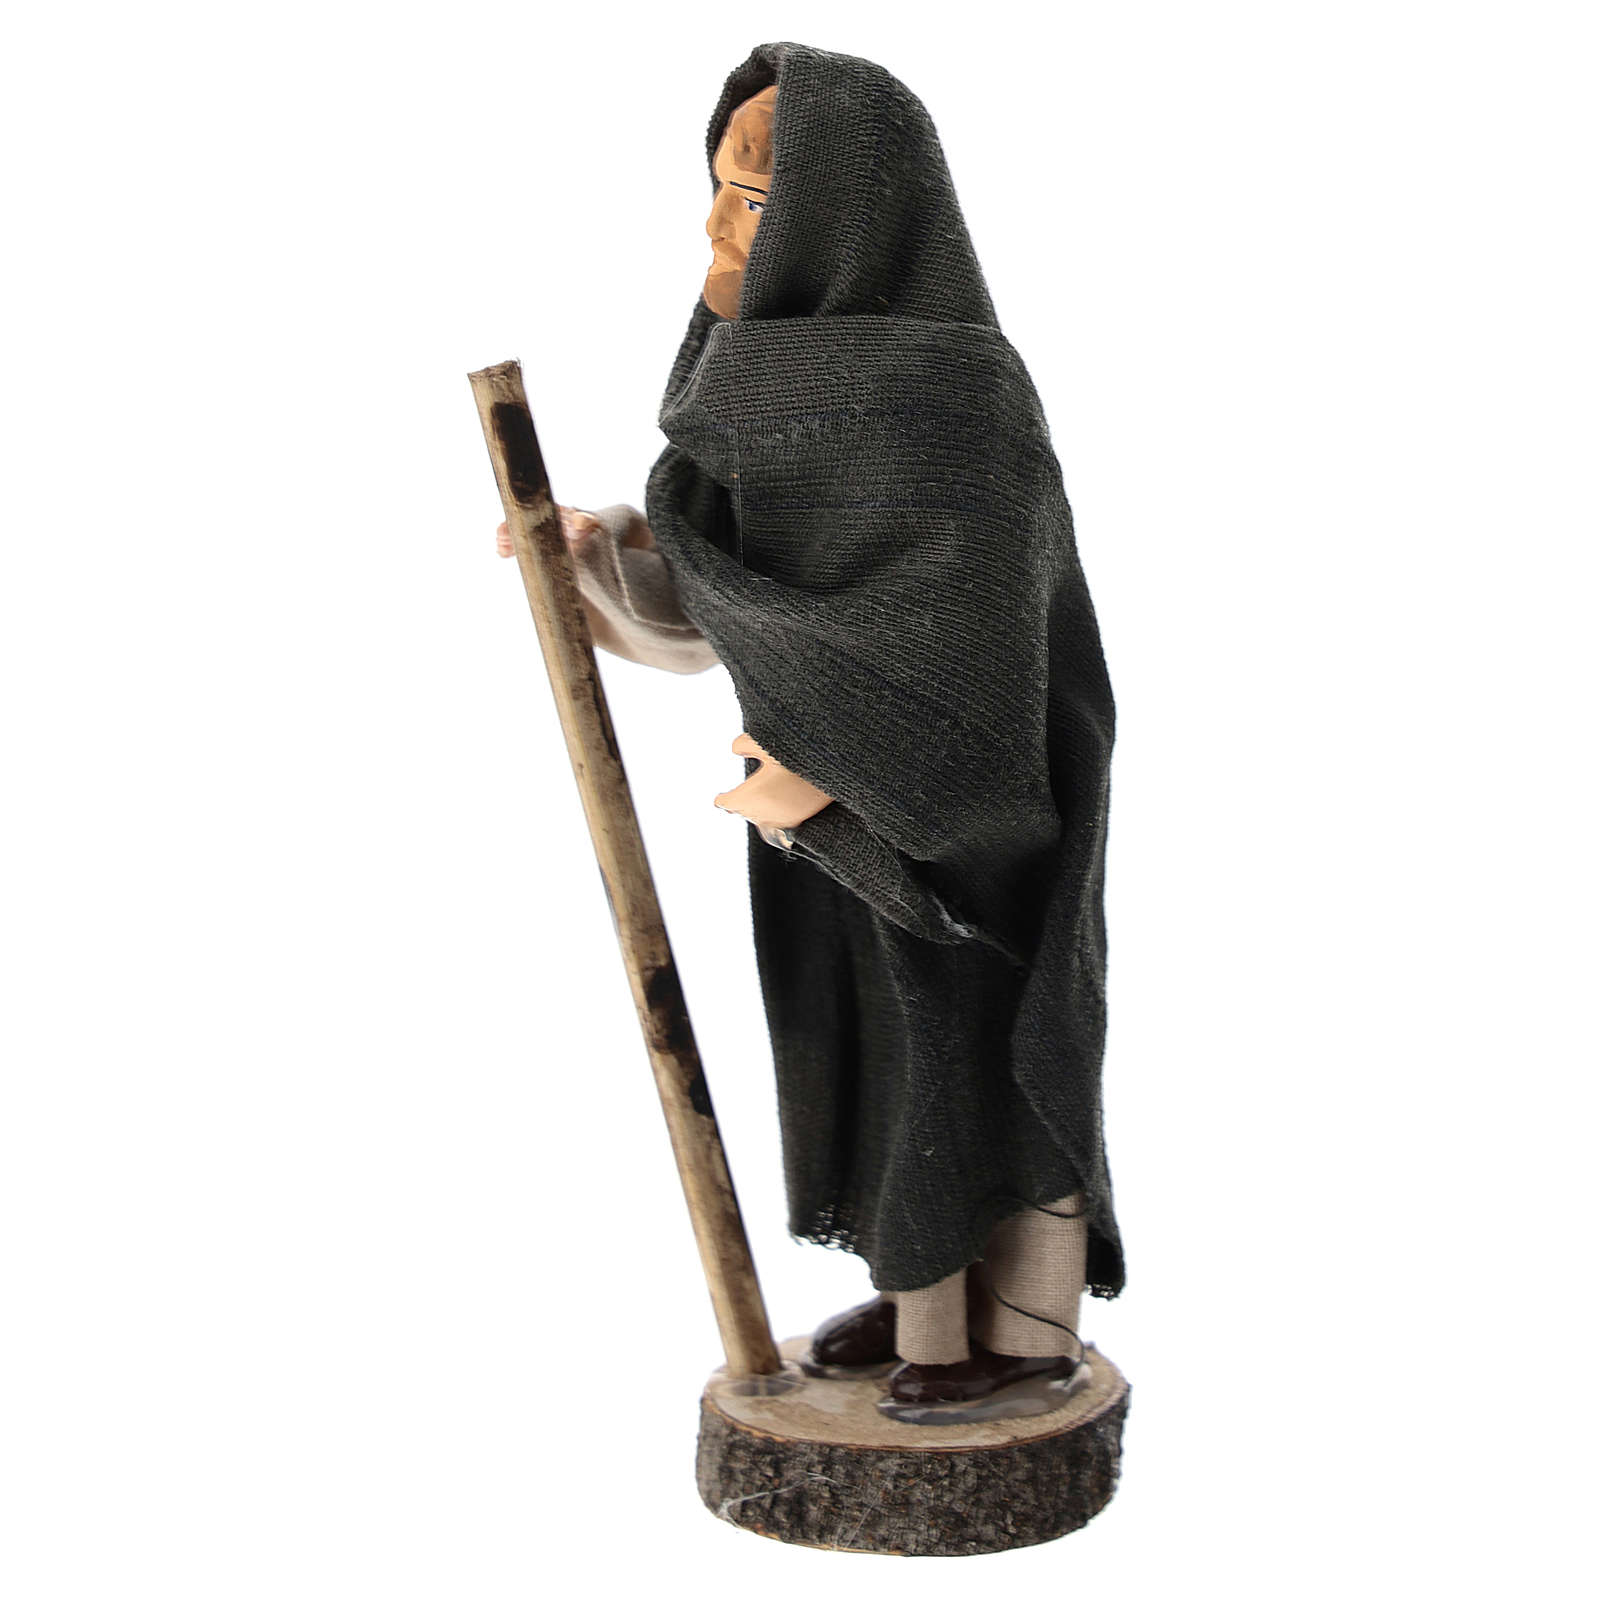 Statue of St. Joseph for Nativity scenes of 12 cm in terracotta and plastic 3